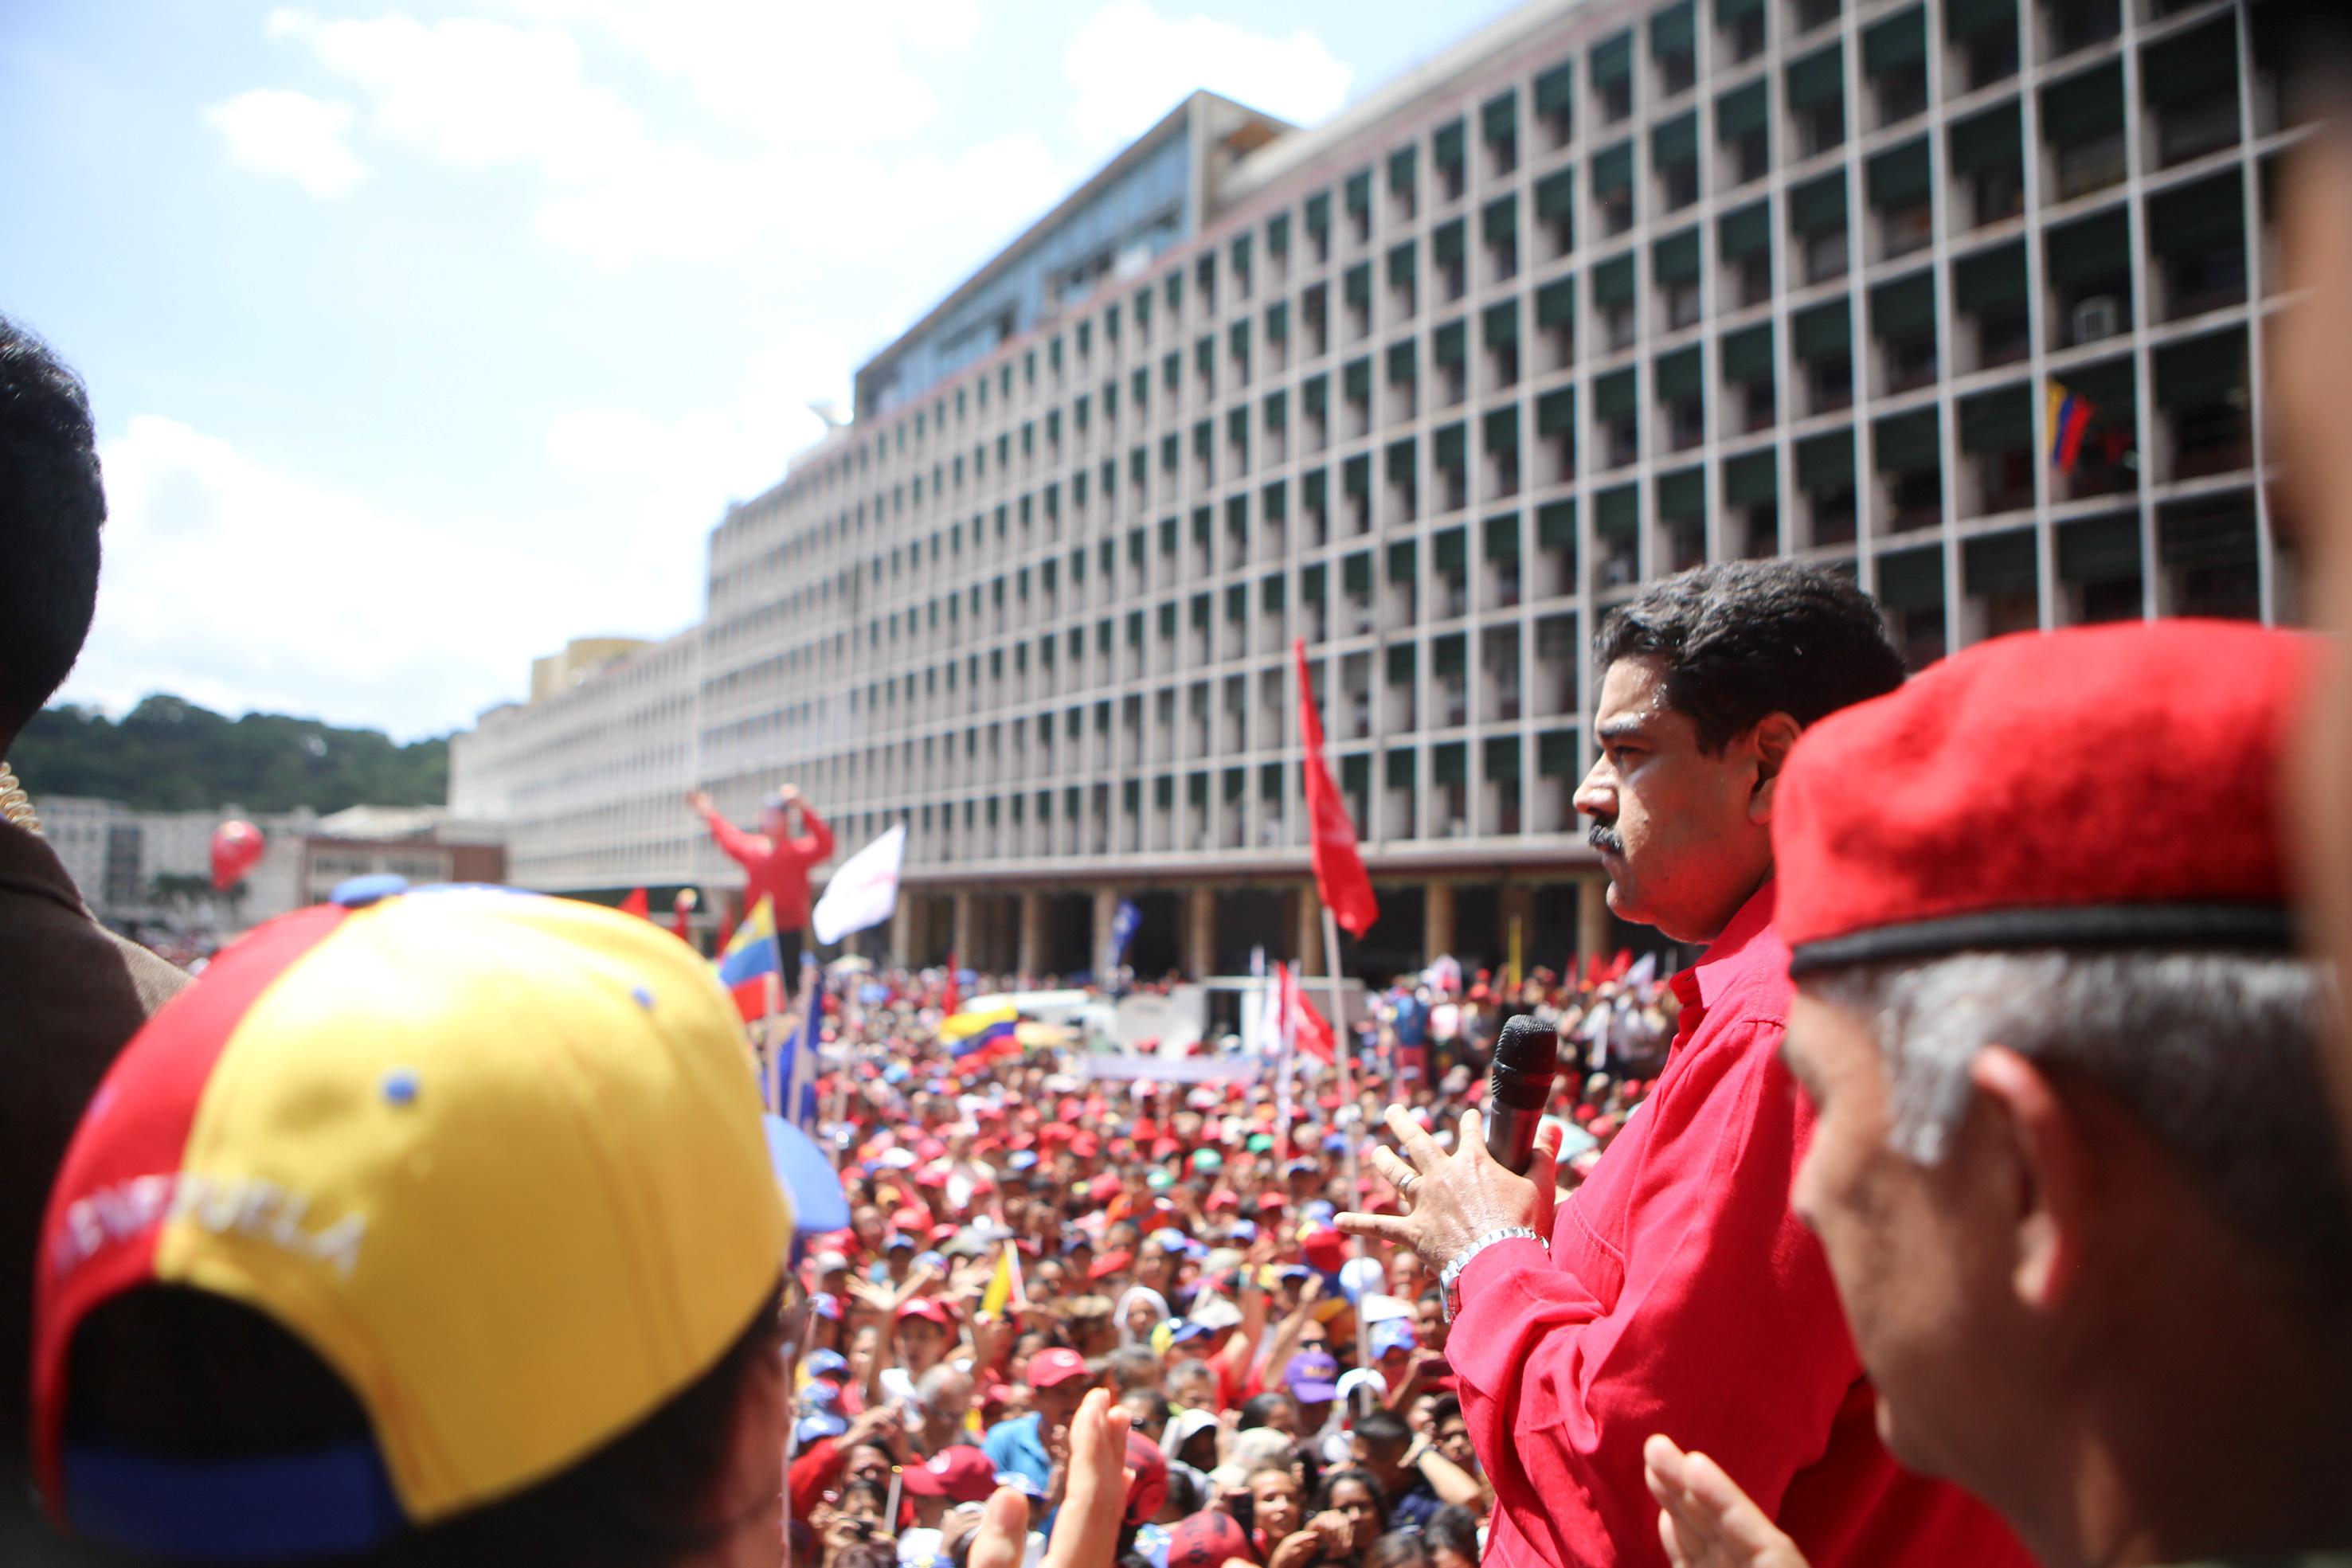 Venezuela's President Nicolas Maduro (R) attends a pro-government gathering in Caracas, Venezuela August 30, 2016.